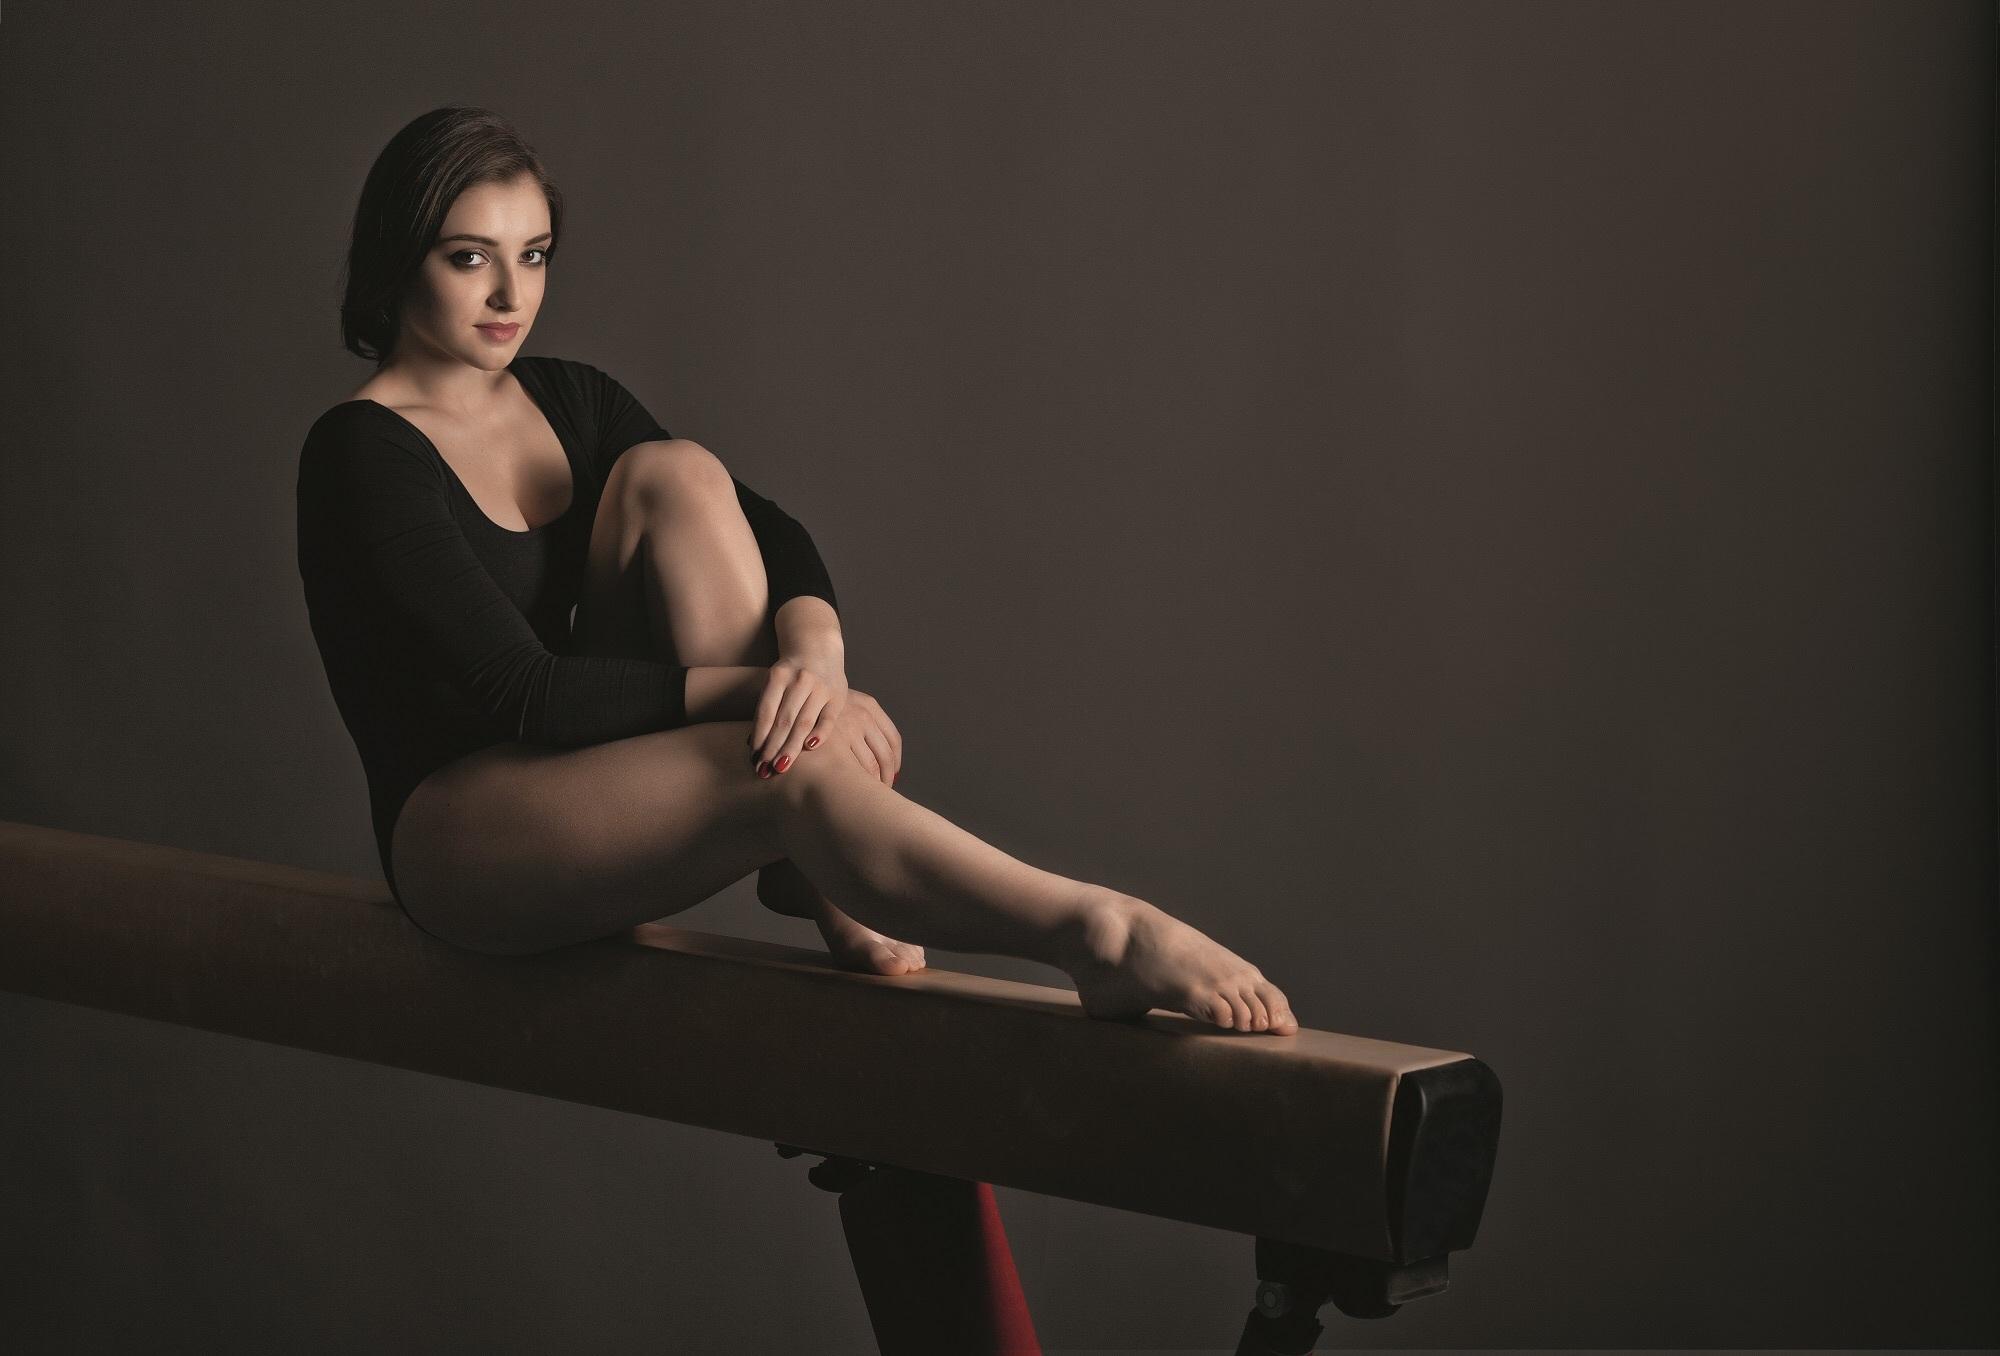 Aliya Mustafina Photoshoot Images & Pictures - Becuo